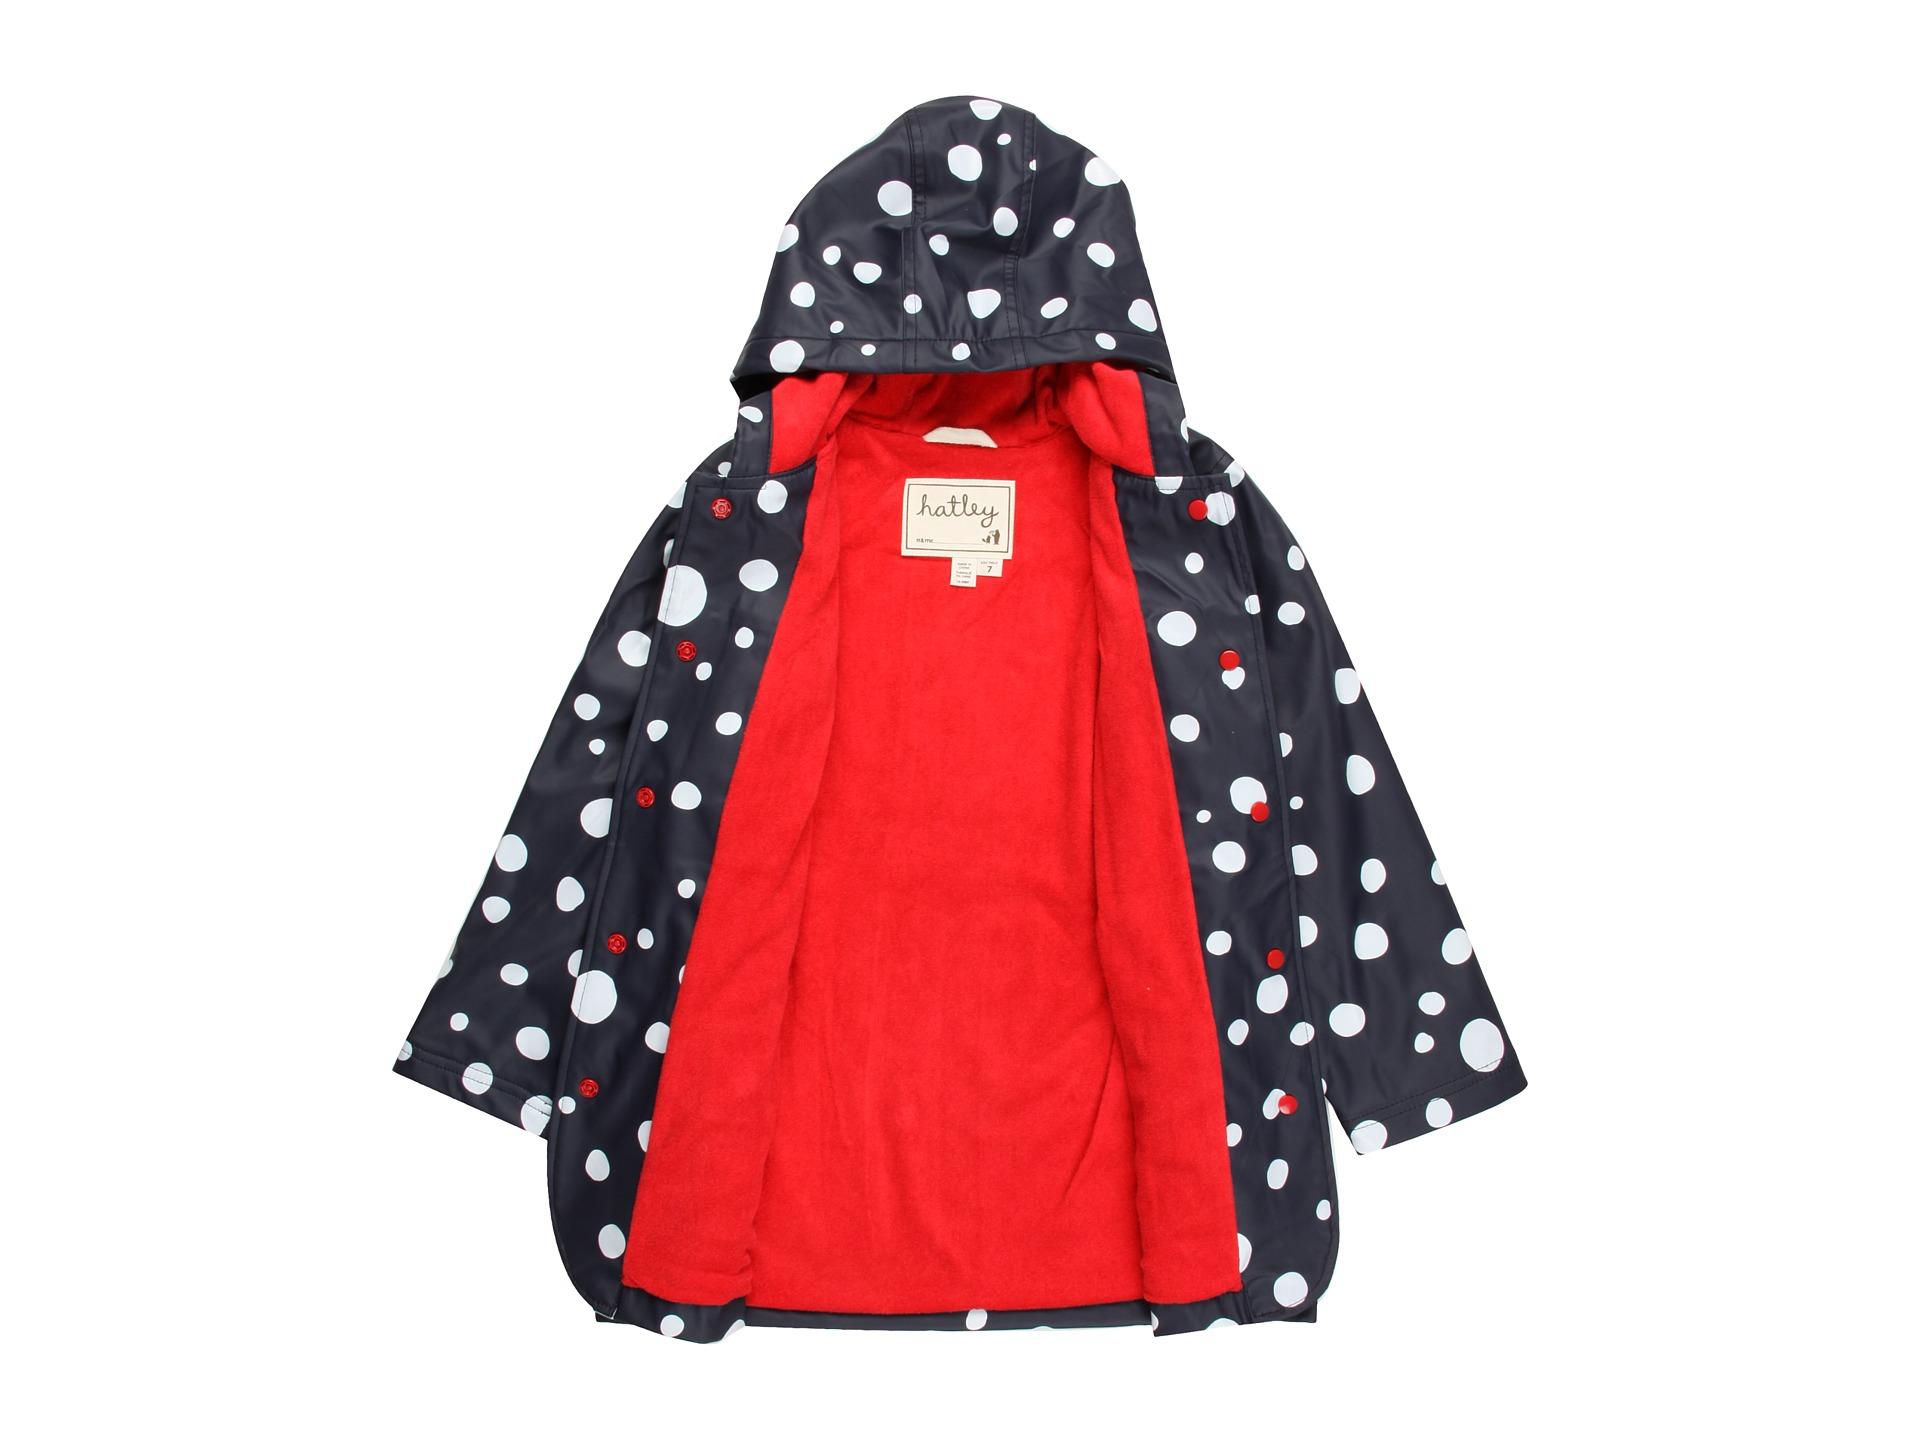 Hatley Kids Rain Coat Toddler Little Kids | Shipped Free ...